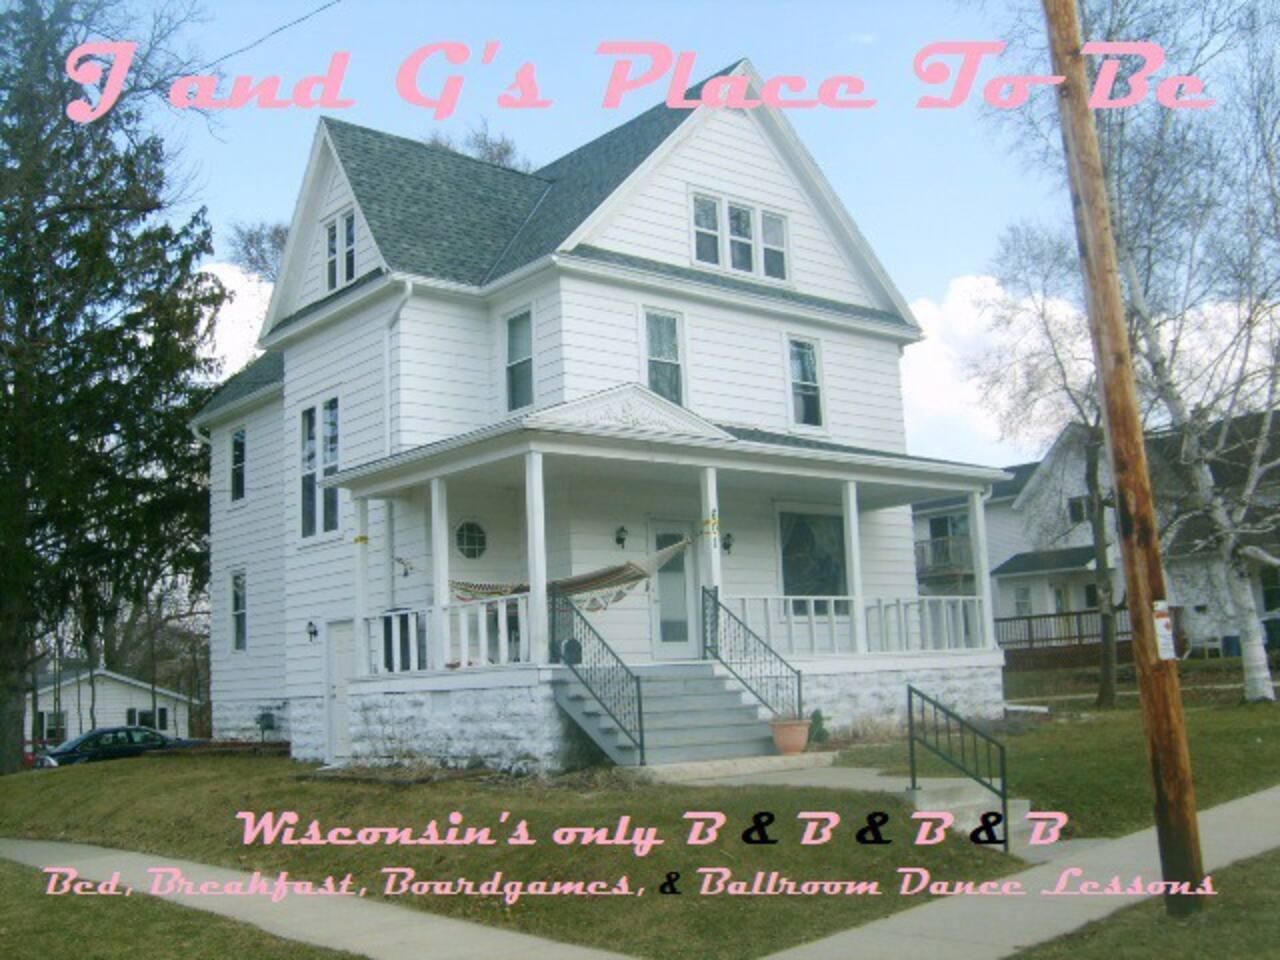 J and G's Place To Be Wisconsin's Only B & B & B & B Bed, Breakfast, Board Games, & Ballroom Dance Lessons